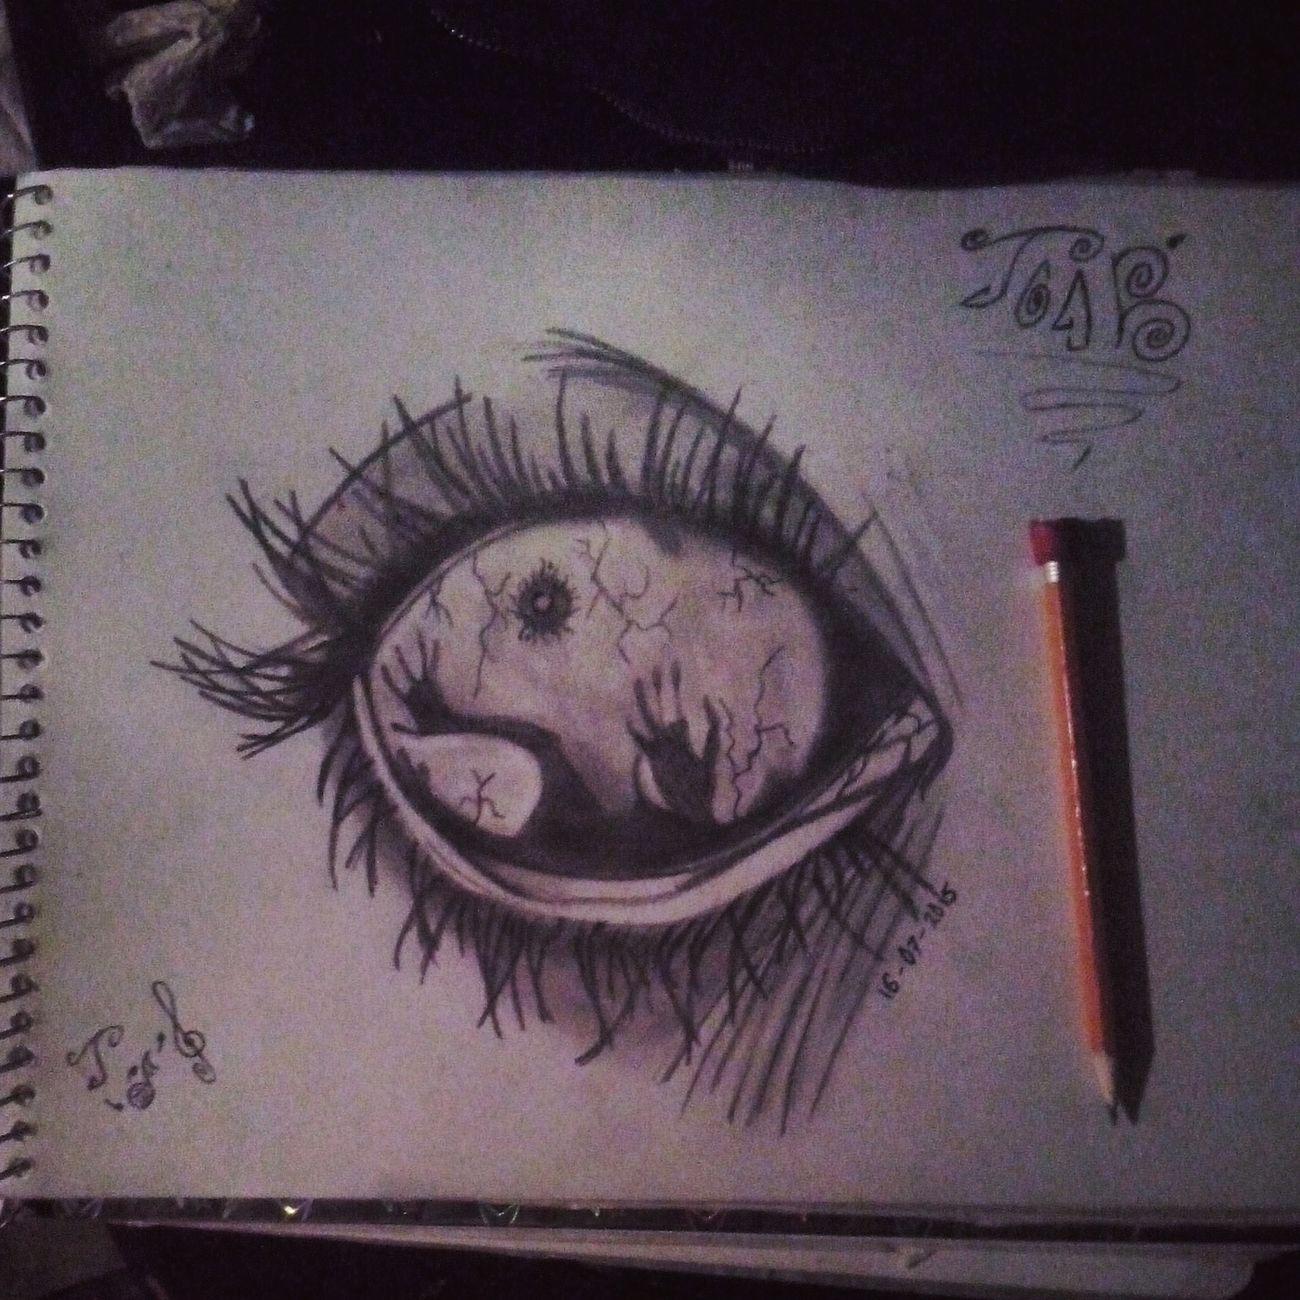 La Mente Detras Del Lapiz Dibujo Mis Dibujos Drawingtime Dibujo A Lapiz Art, Drawing, Creativity Ojo Eye Artistic Arte